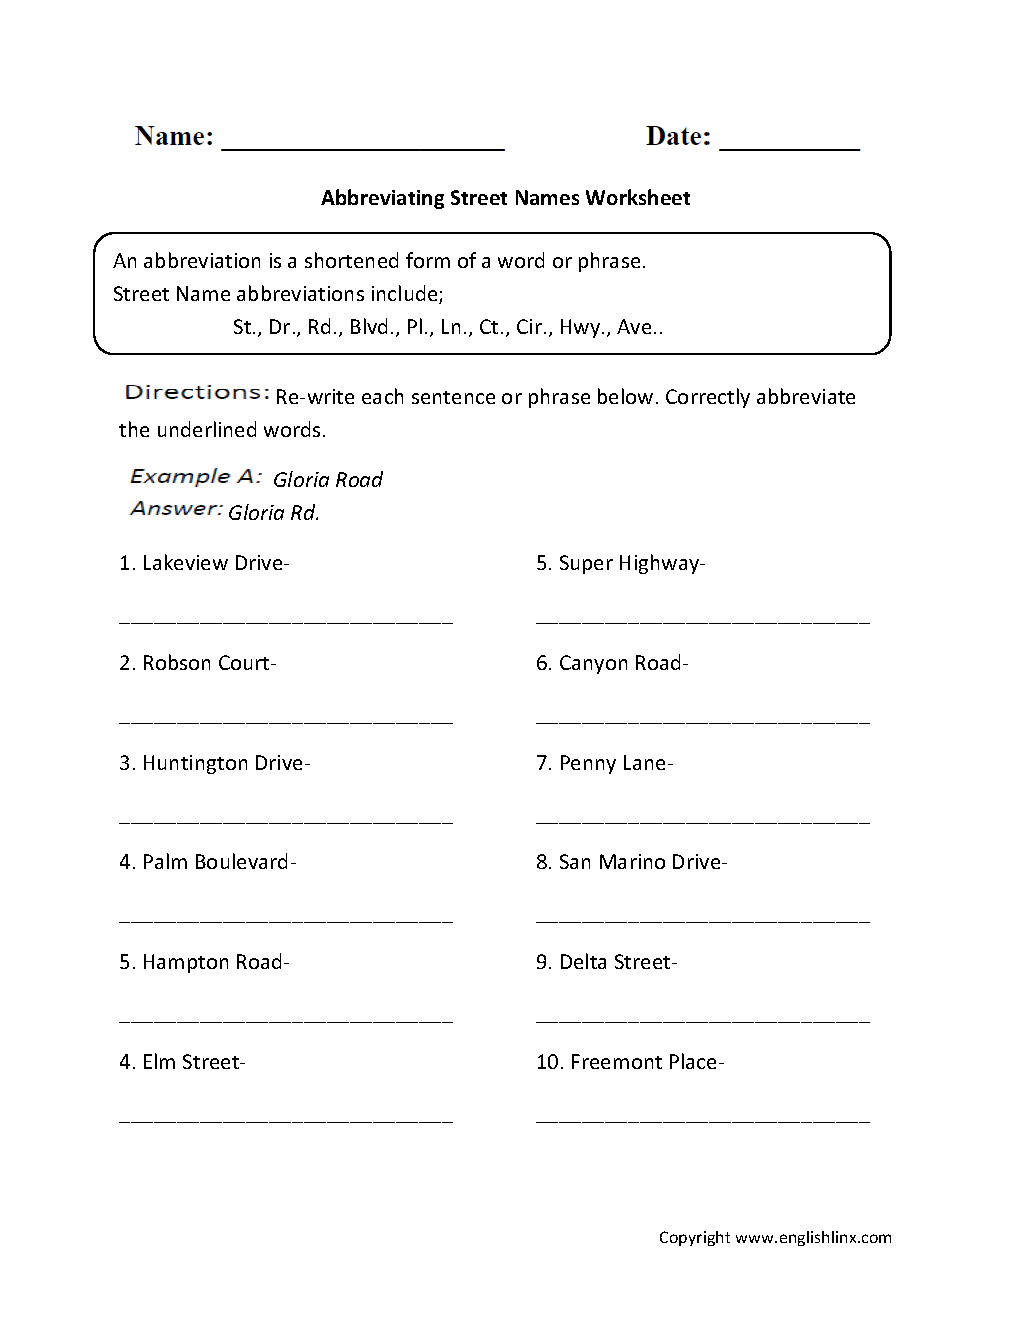 medium resolution of Englishlinx.com   Abbreviations Worksheets   2nd grade worksheets